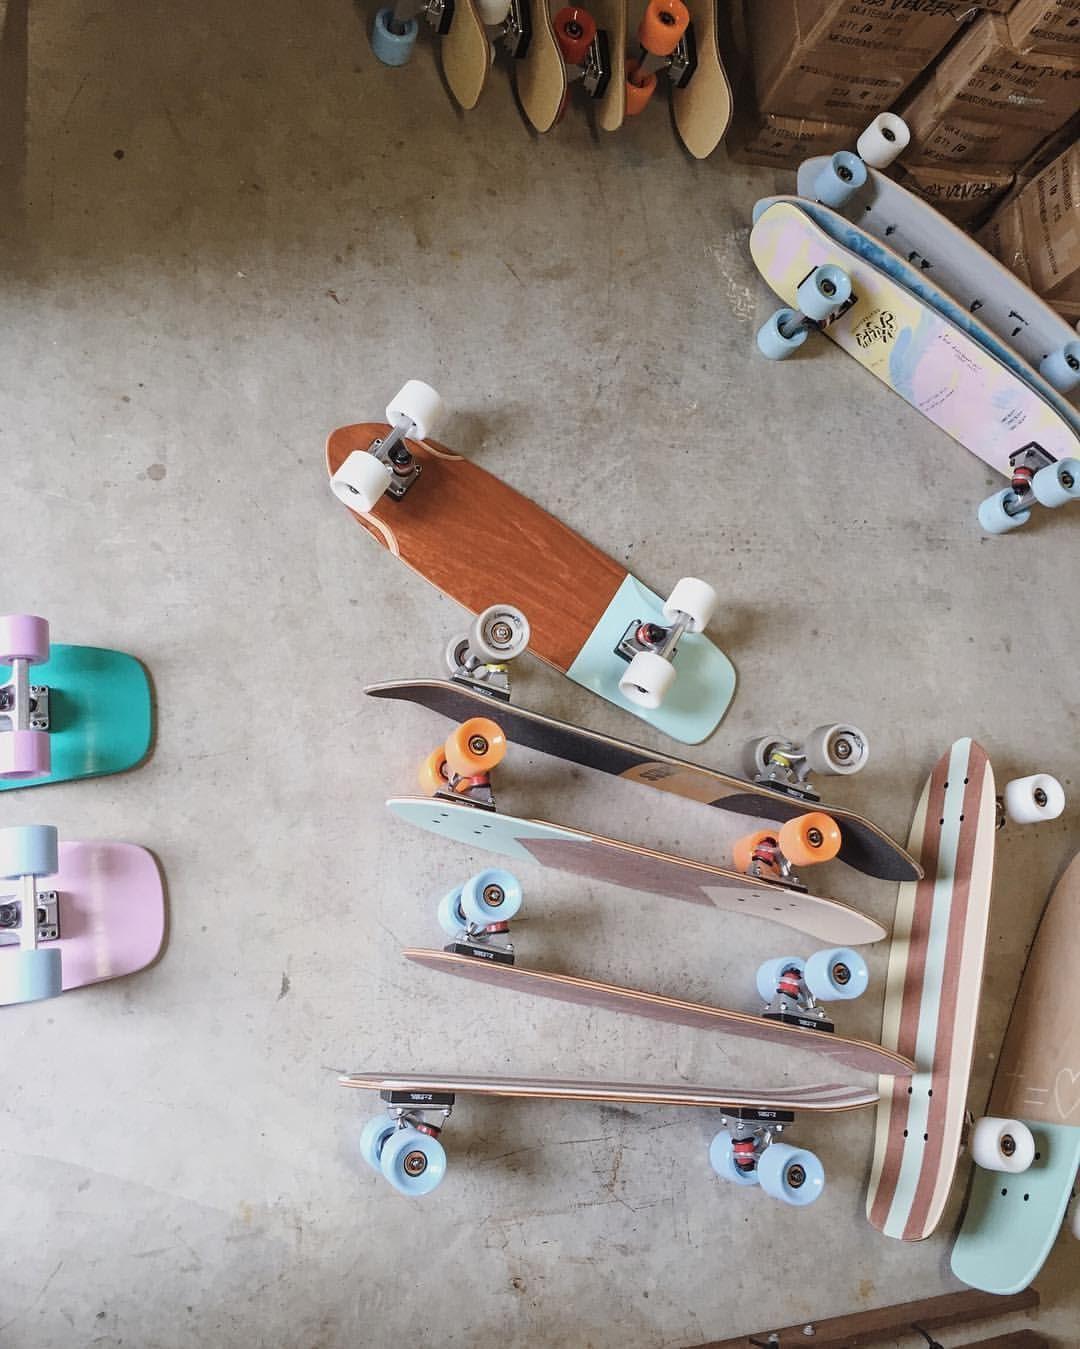 Kippy Skateboards On Instagram So Many Skateboard Find Your